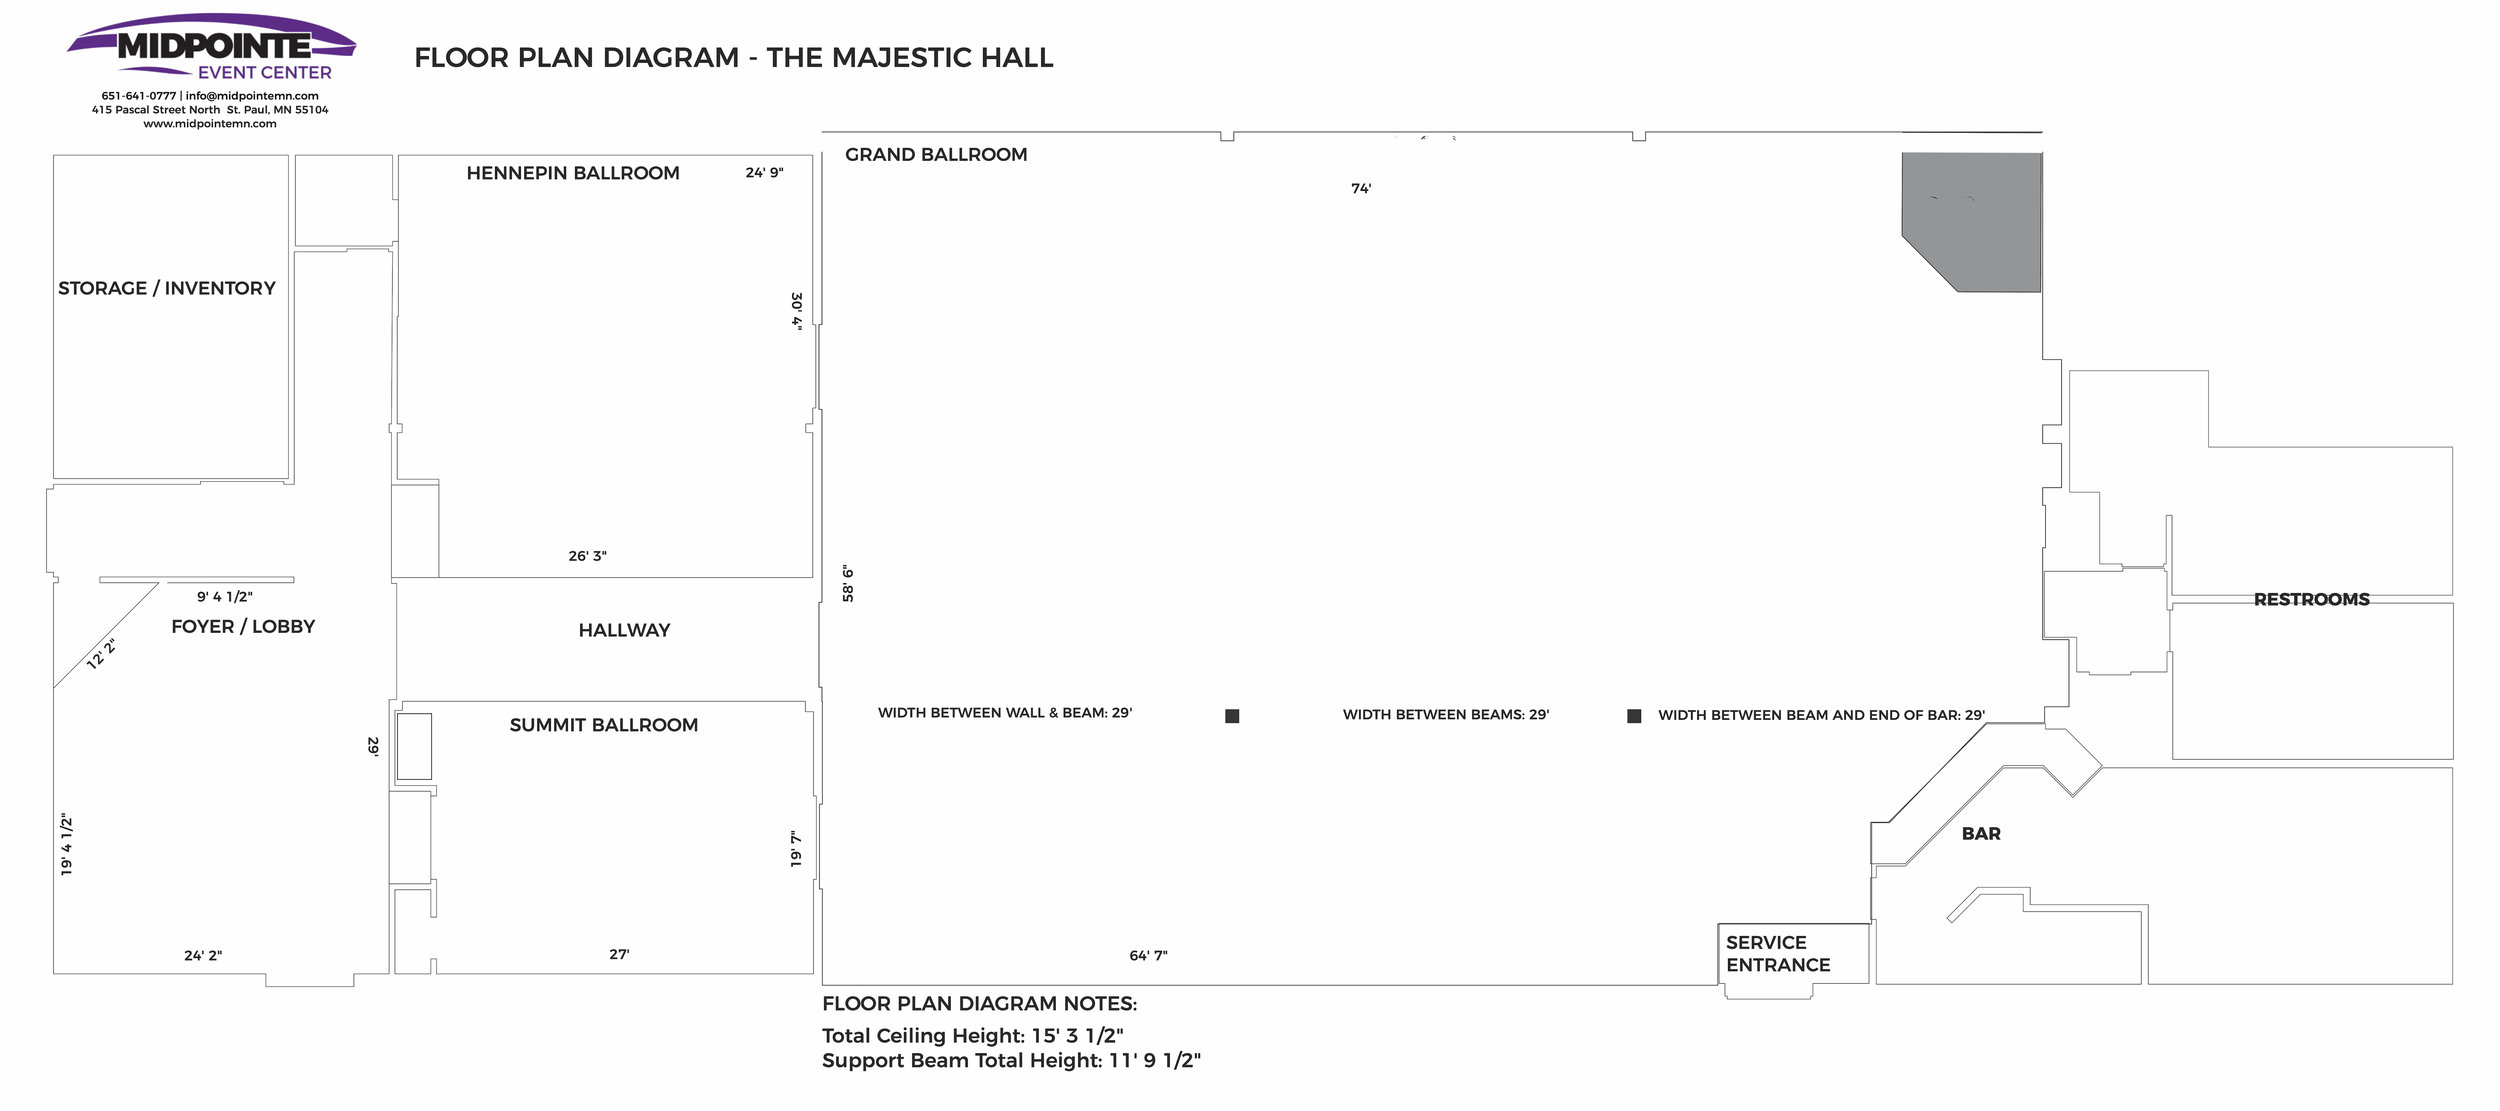 Majestic+Hall+Floor+Plan+Dimensions.jpg